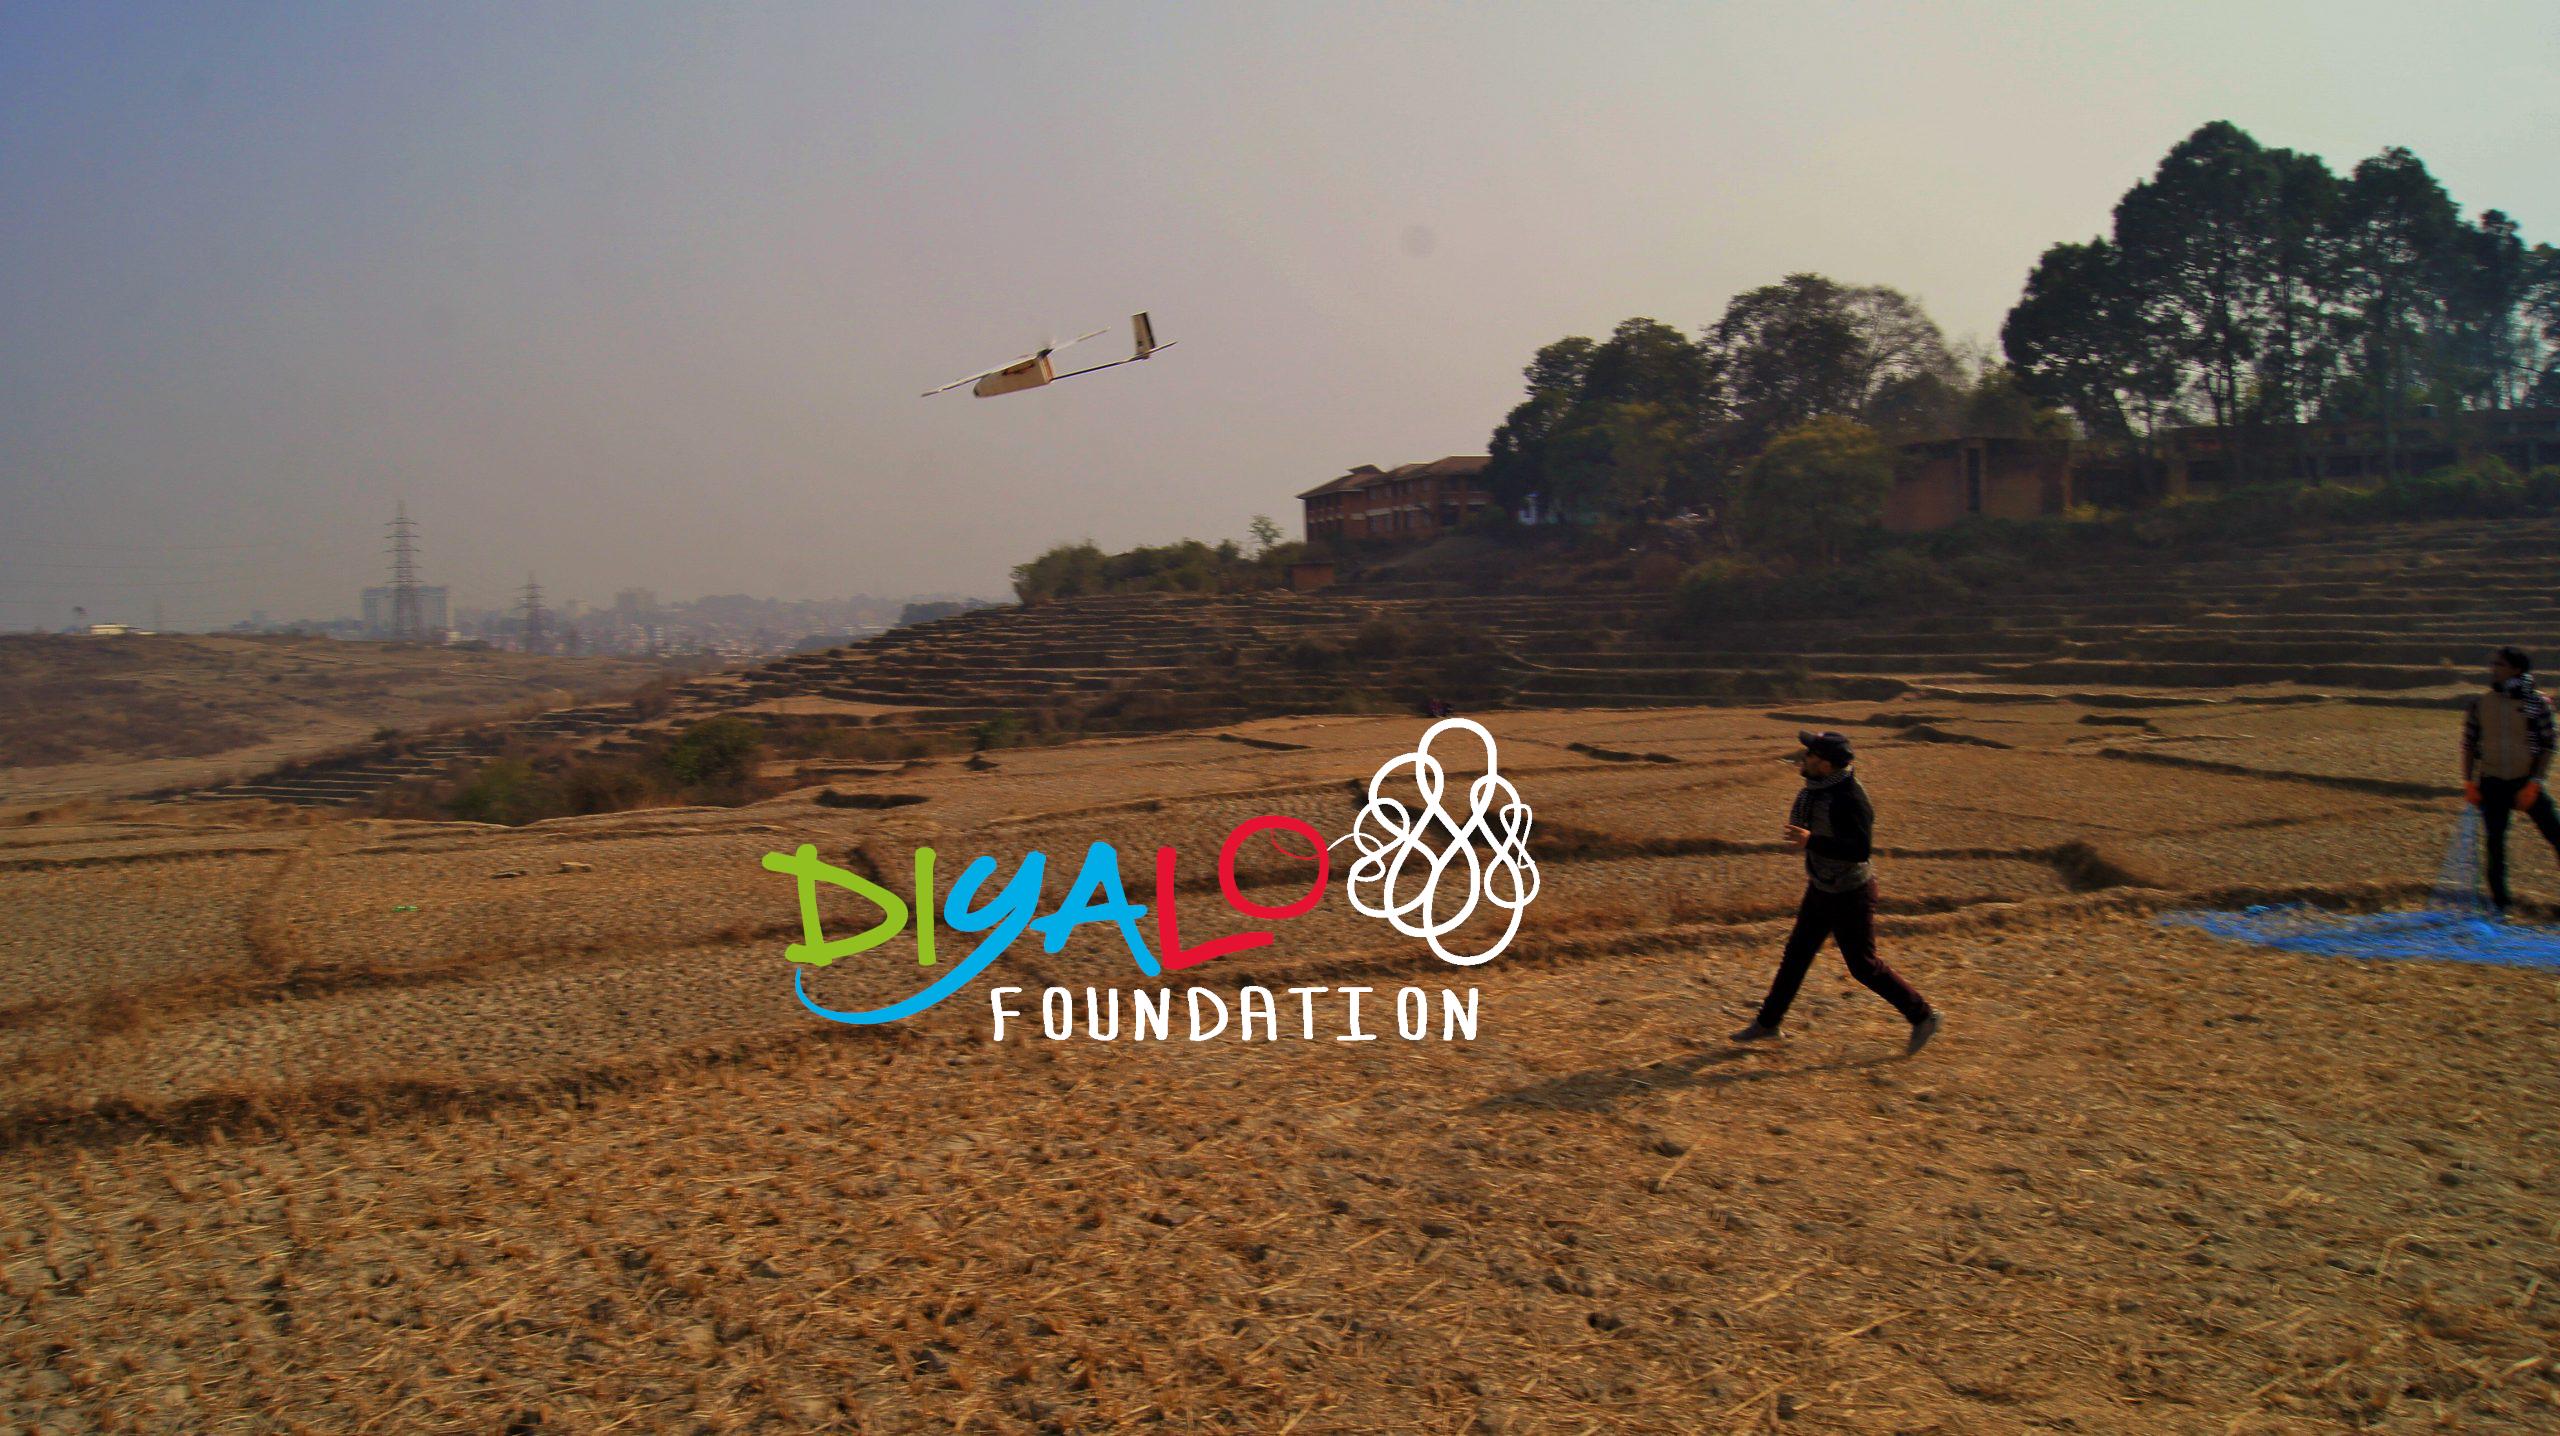 Diyalo Foundation